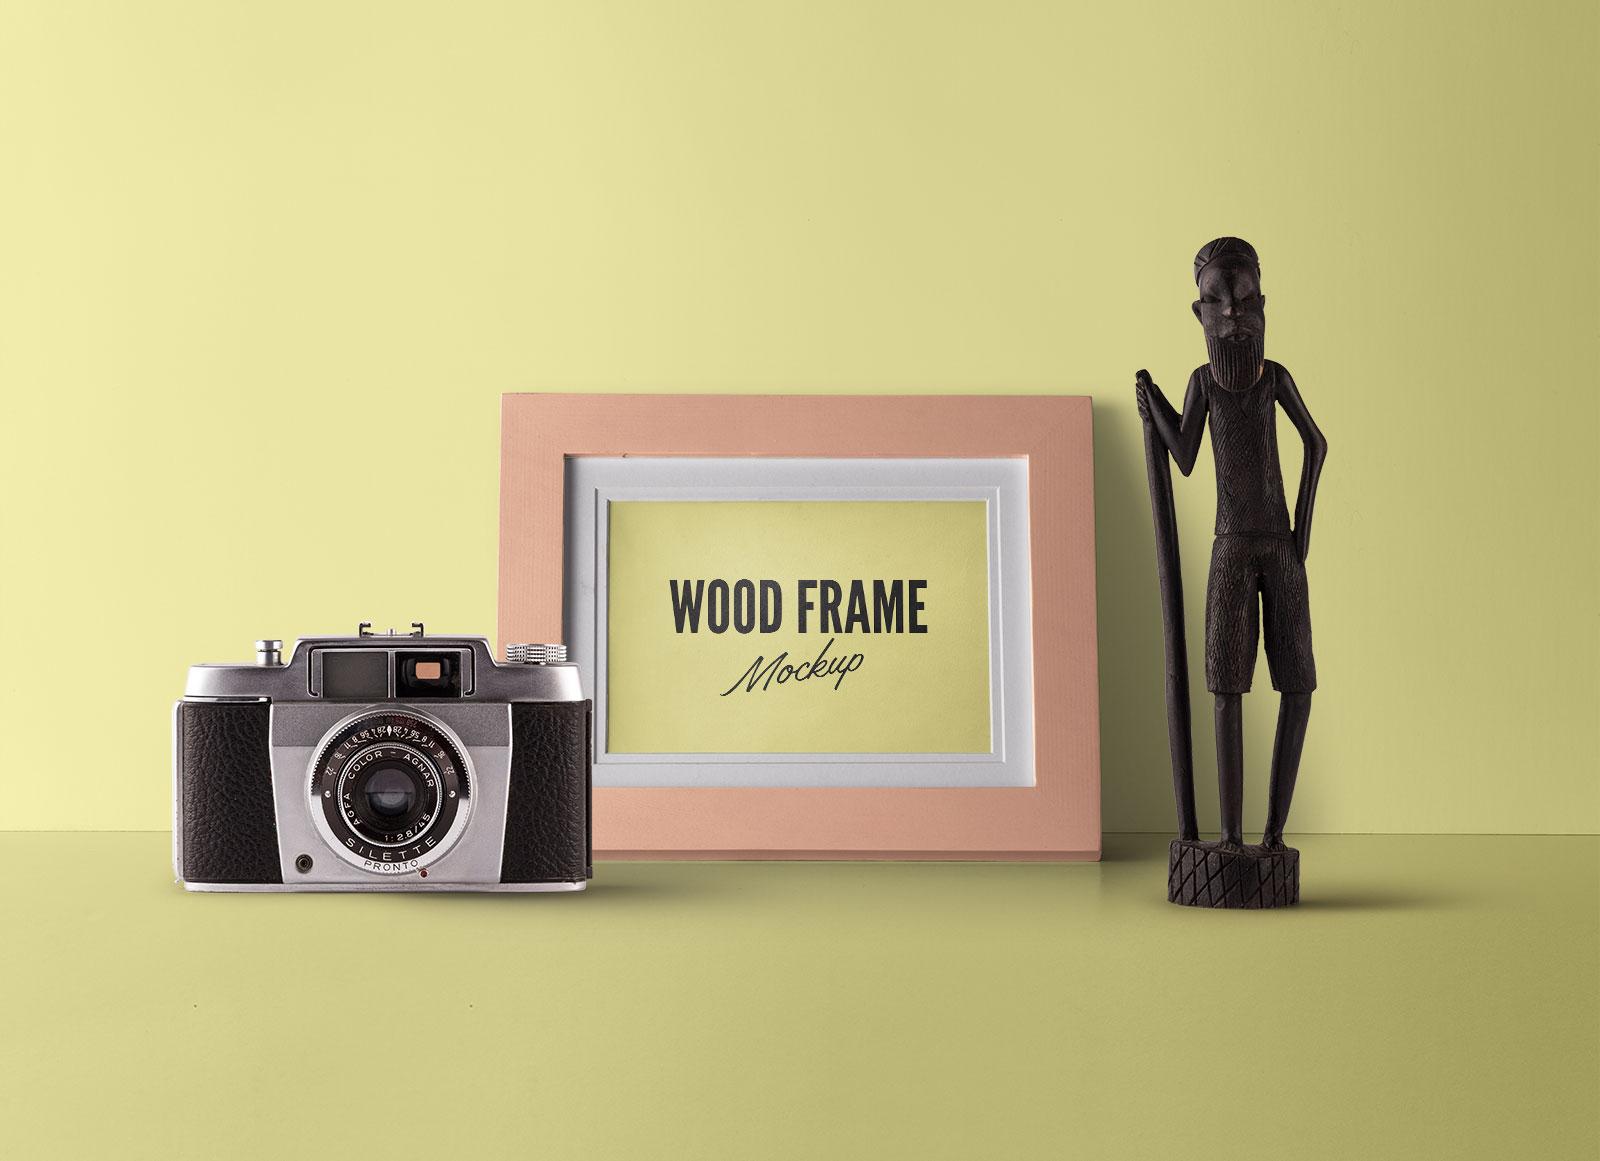 Free-Fully-Customizable-Wood-Photo-Frame-Mockup-PSD